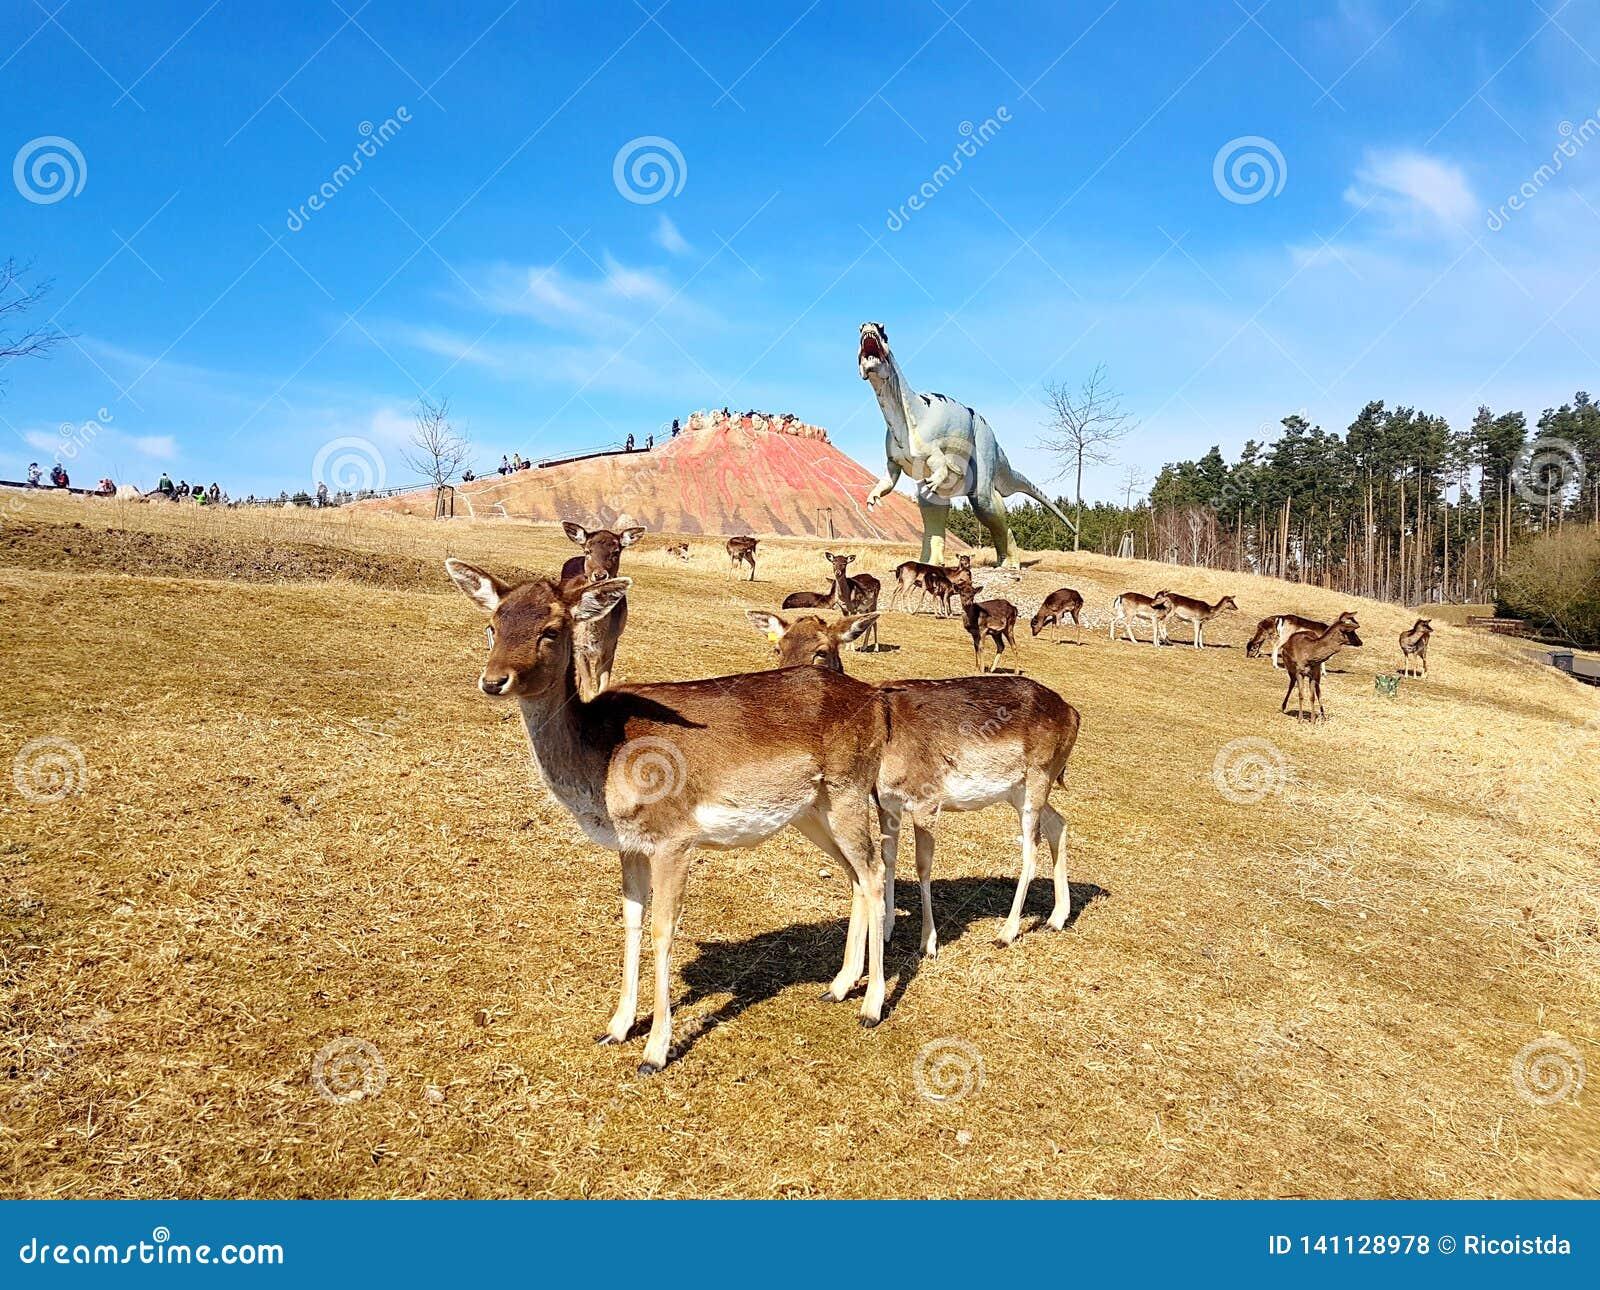 Free-roaming deer in dinosaur park with volcano